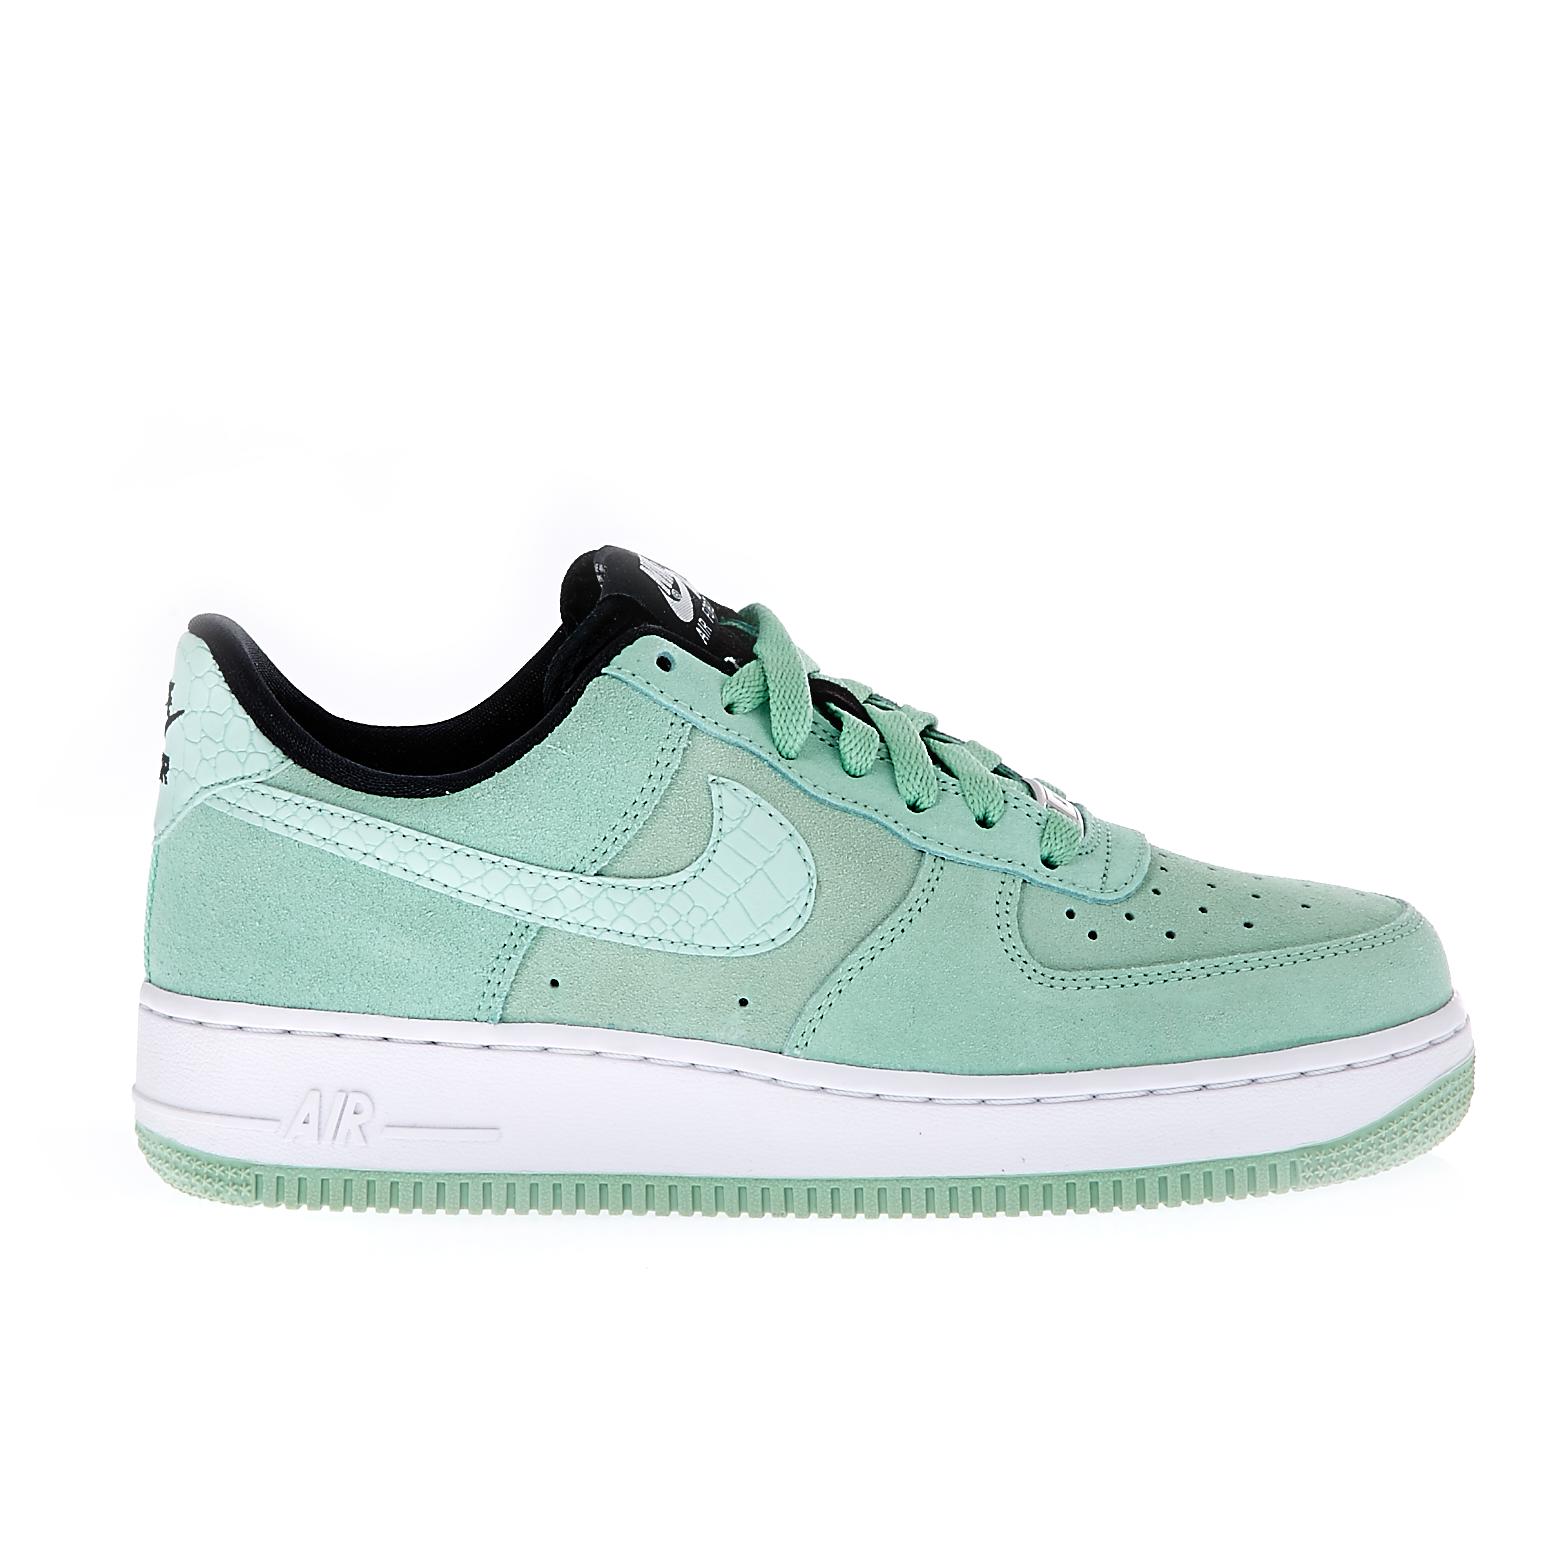 NIKE – Γυναικεία αθλητικά παπούτσια NIKE AIR FORCE 1 φυστικί